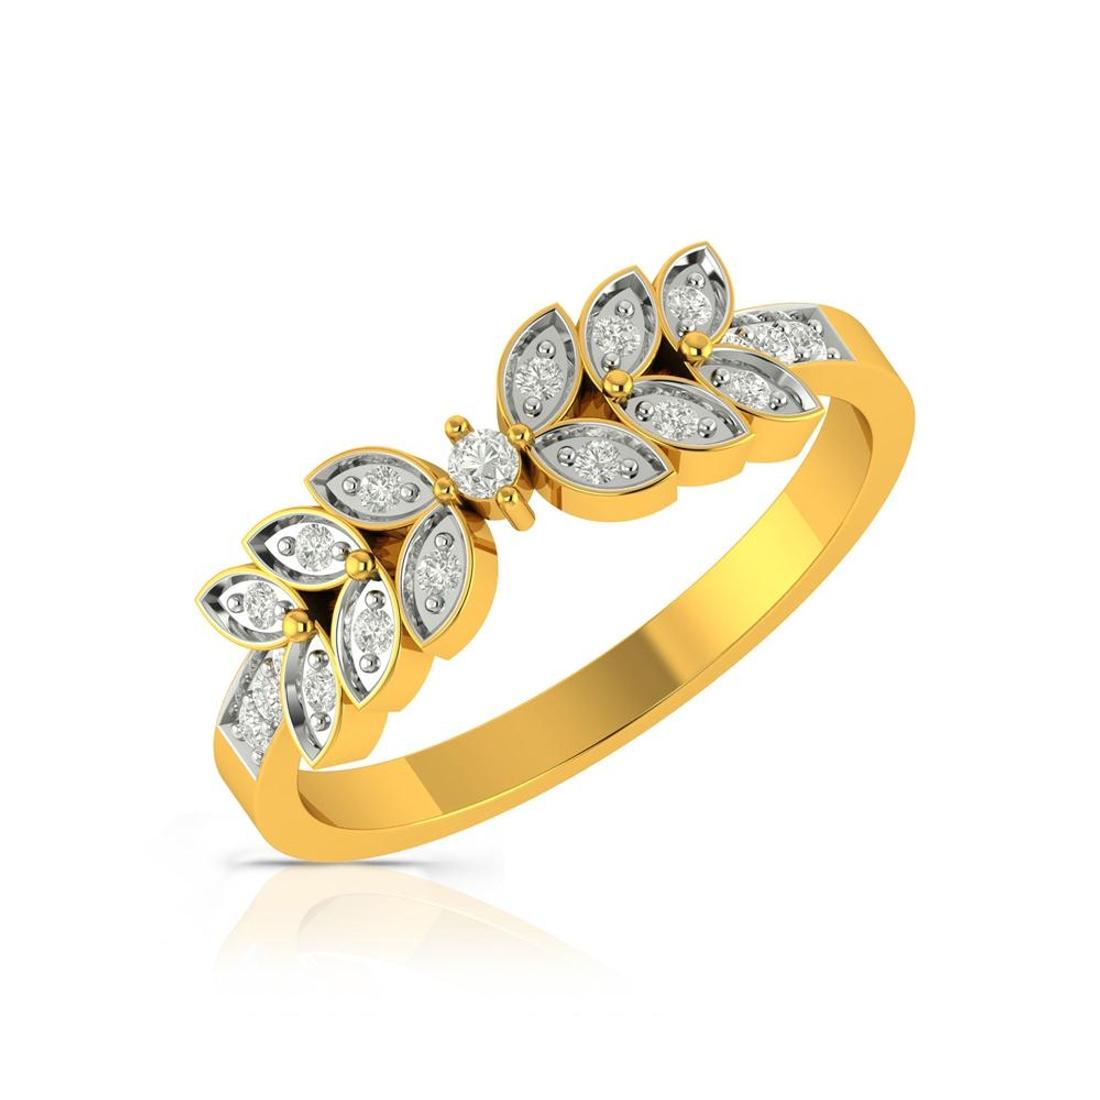 Buy Charu Jewels Diamond Ladies Ring CJLR0497 Online in India